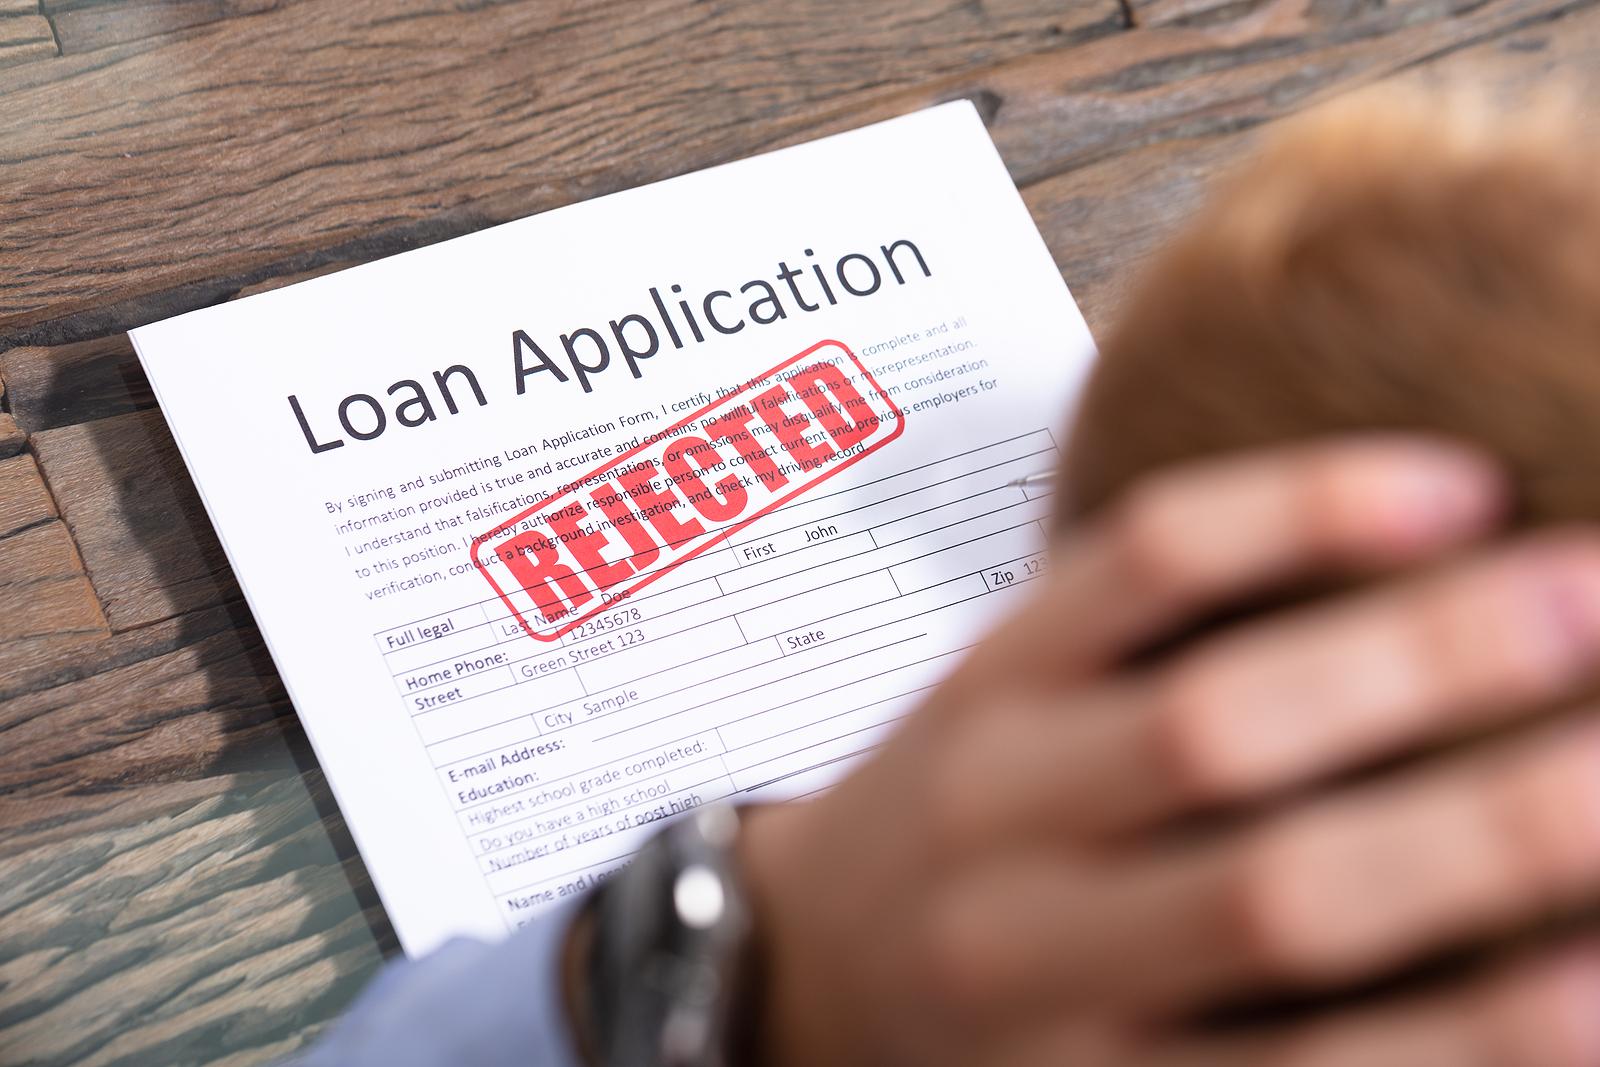 Merchant Cash Advance Requirements - Does My Business Qualify?